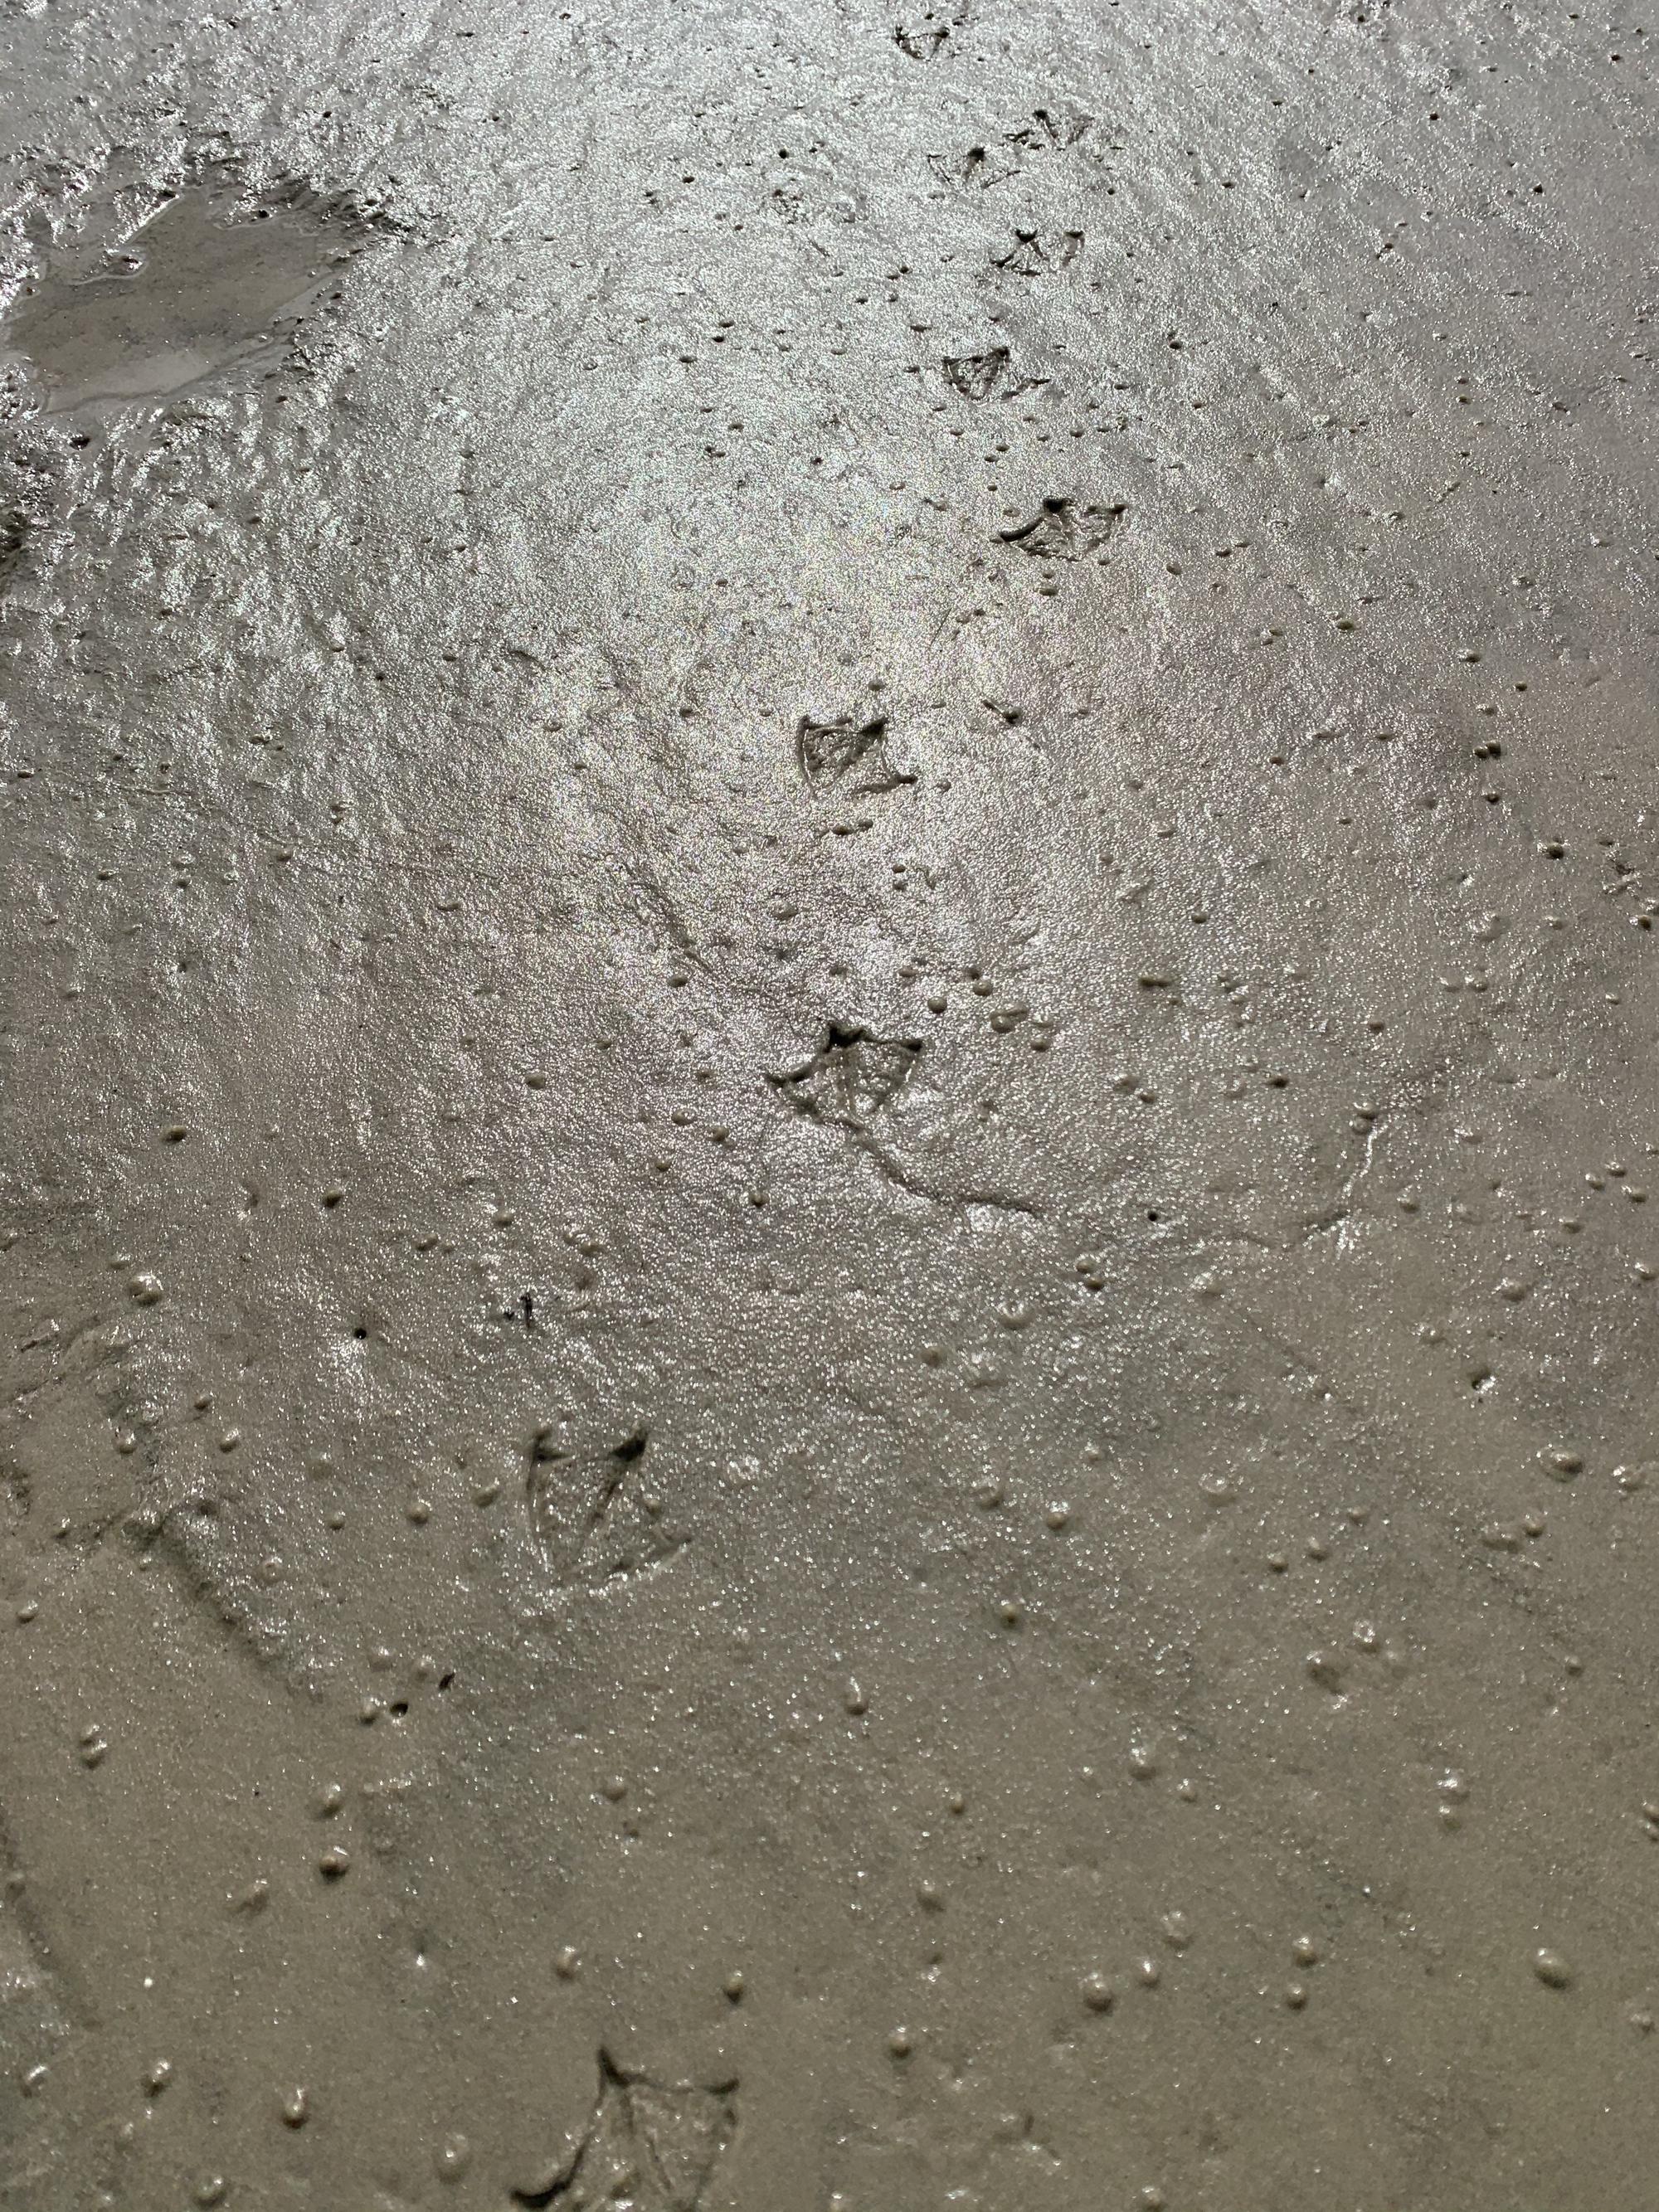 Bird tracks in the mud